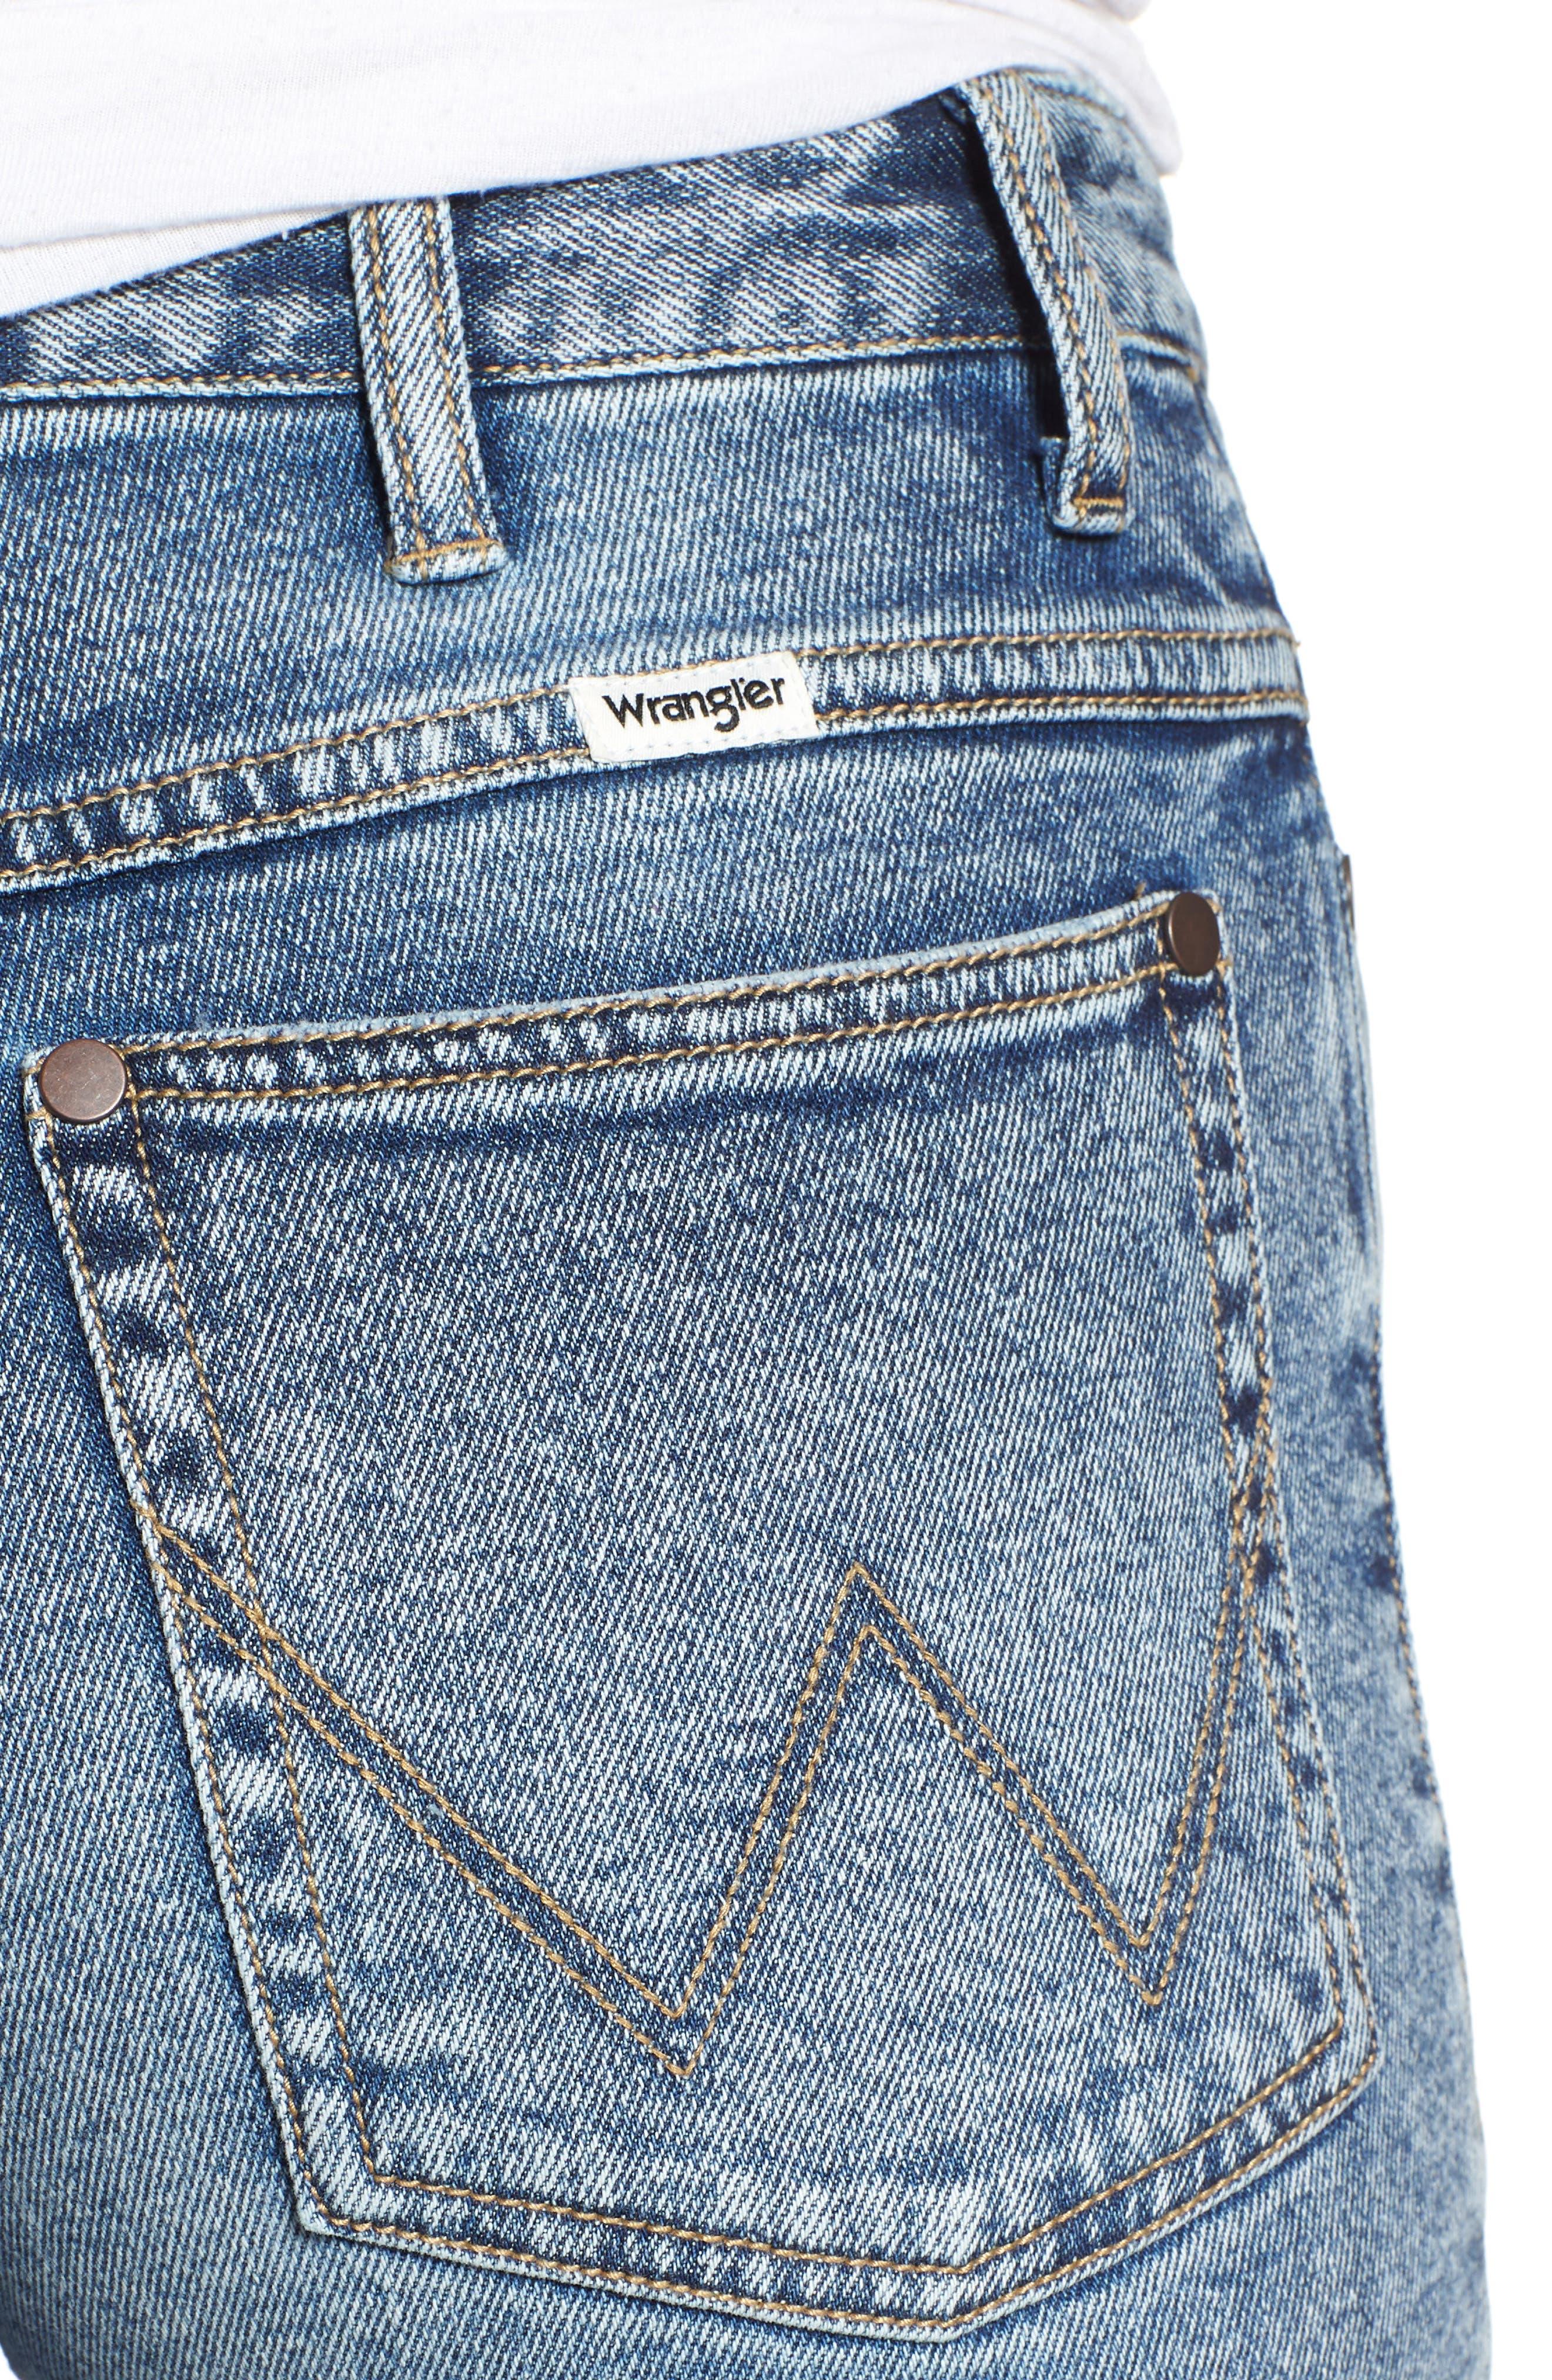 Acid Wash High Waist Crop Jeans,                             Alternate thumbnail 4, color,                             Dark Acid